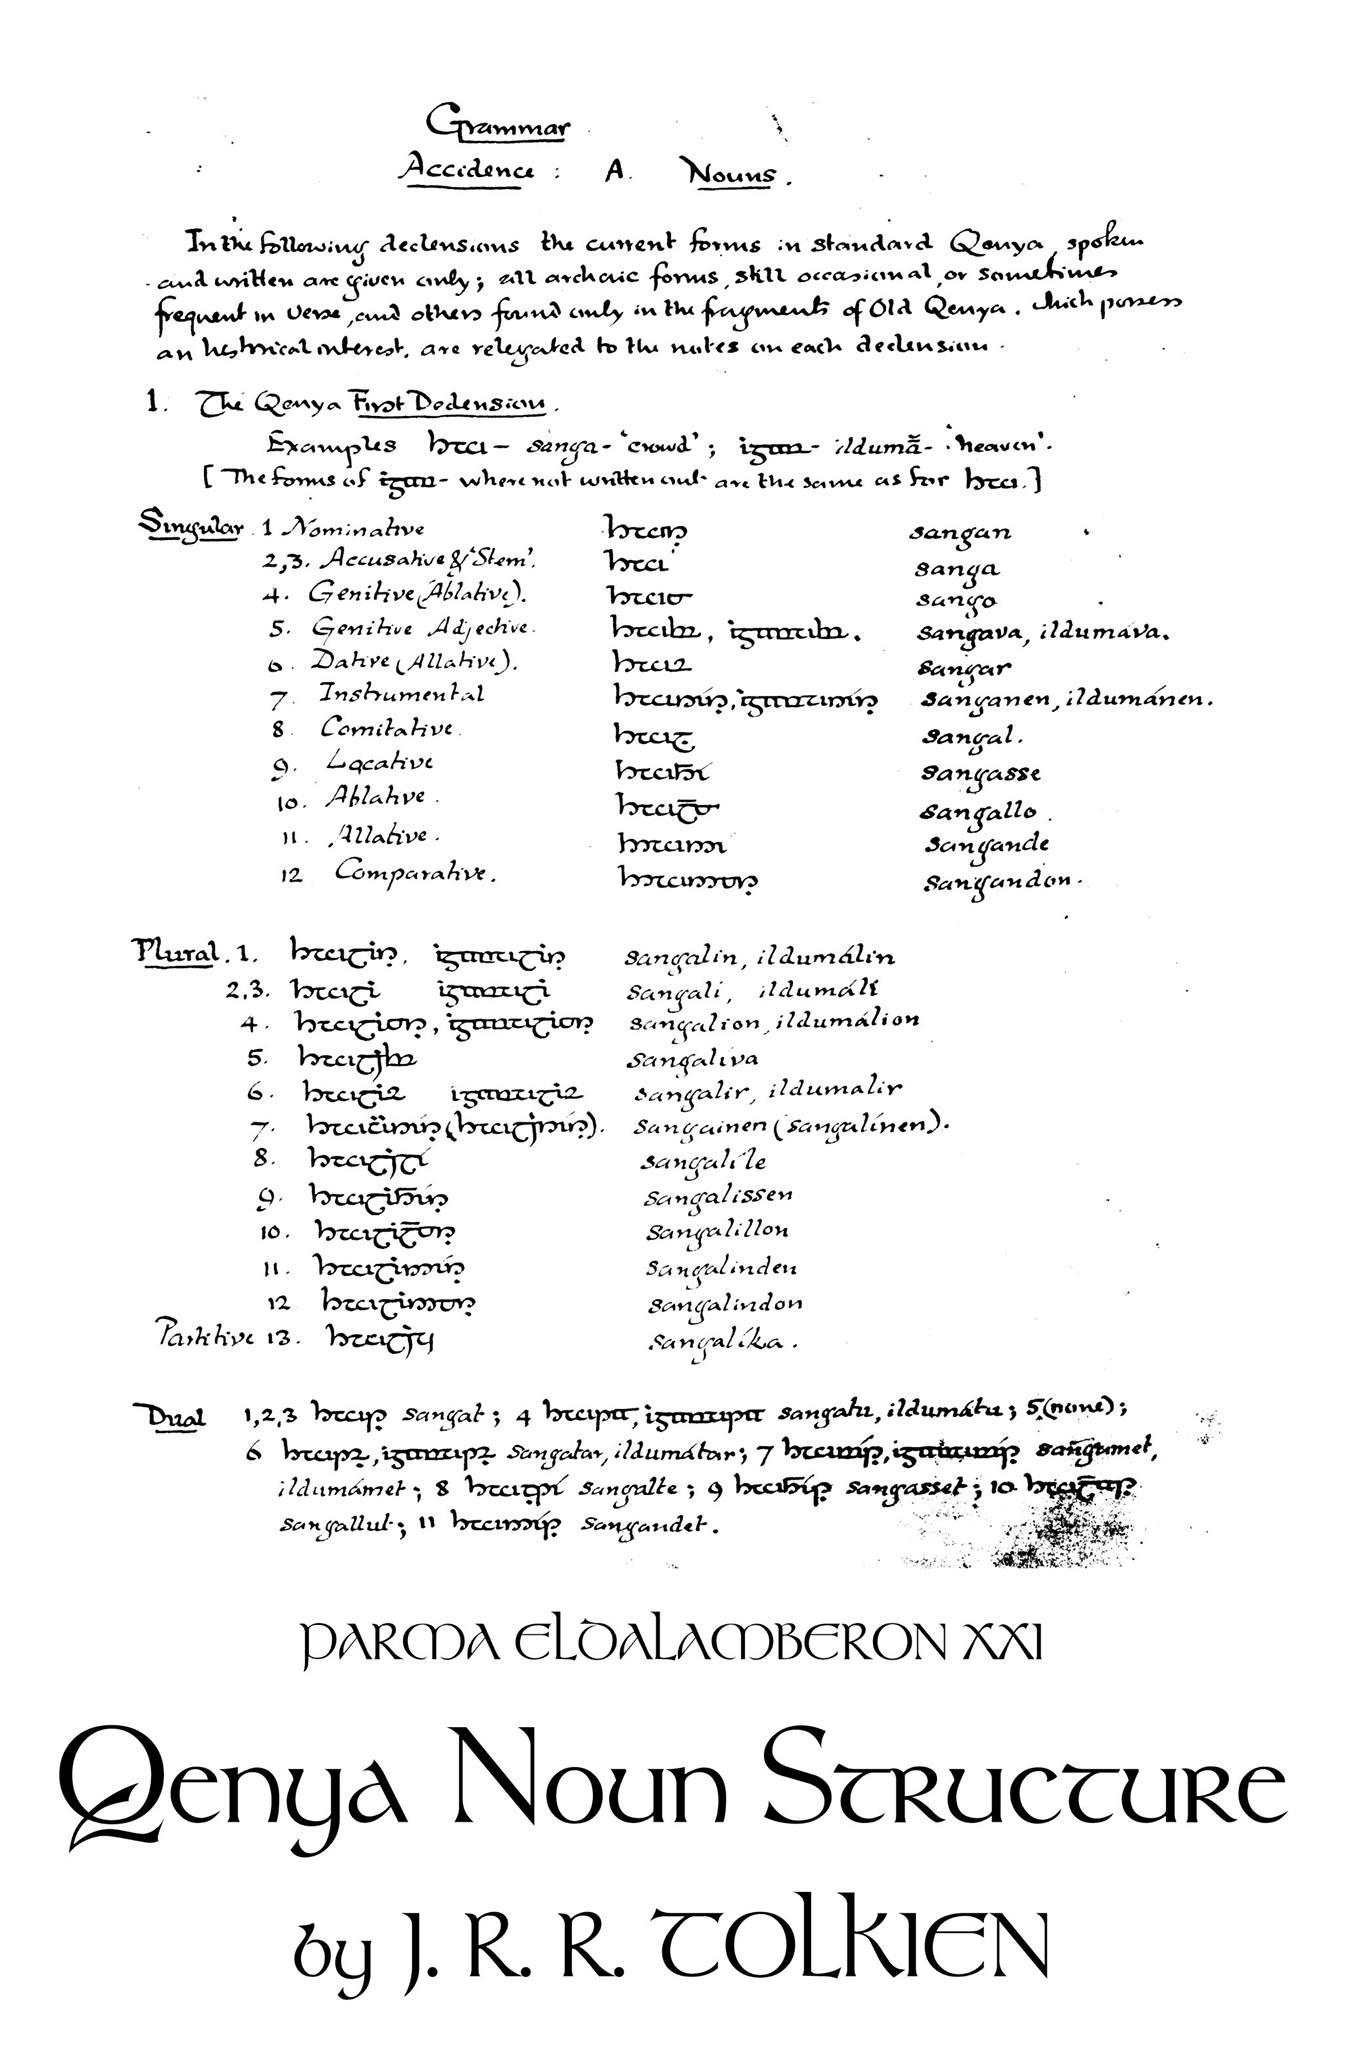 Parma Eldalamberon 21 (c) Tolkien Estate and respective owners